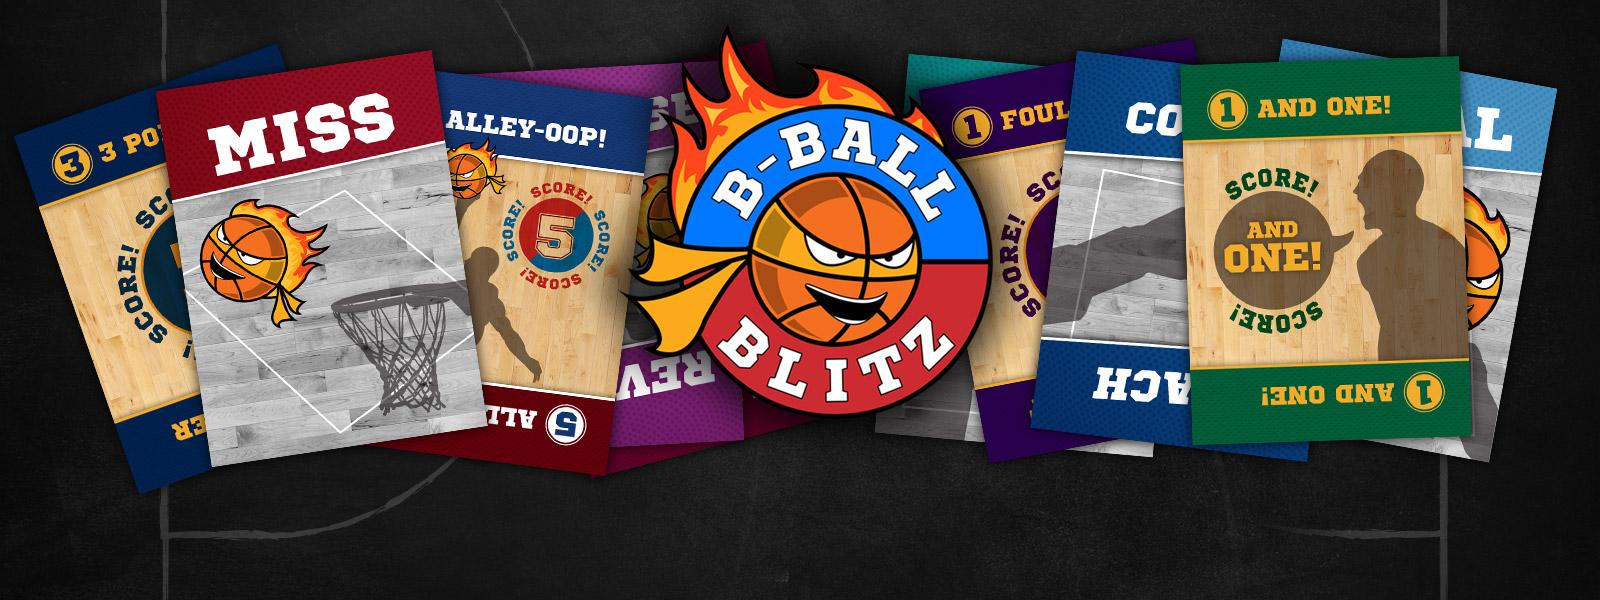 B-Ball Blitz Family Card Game Banner